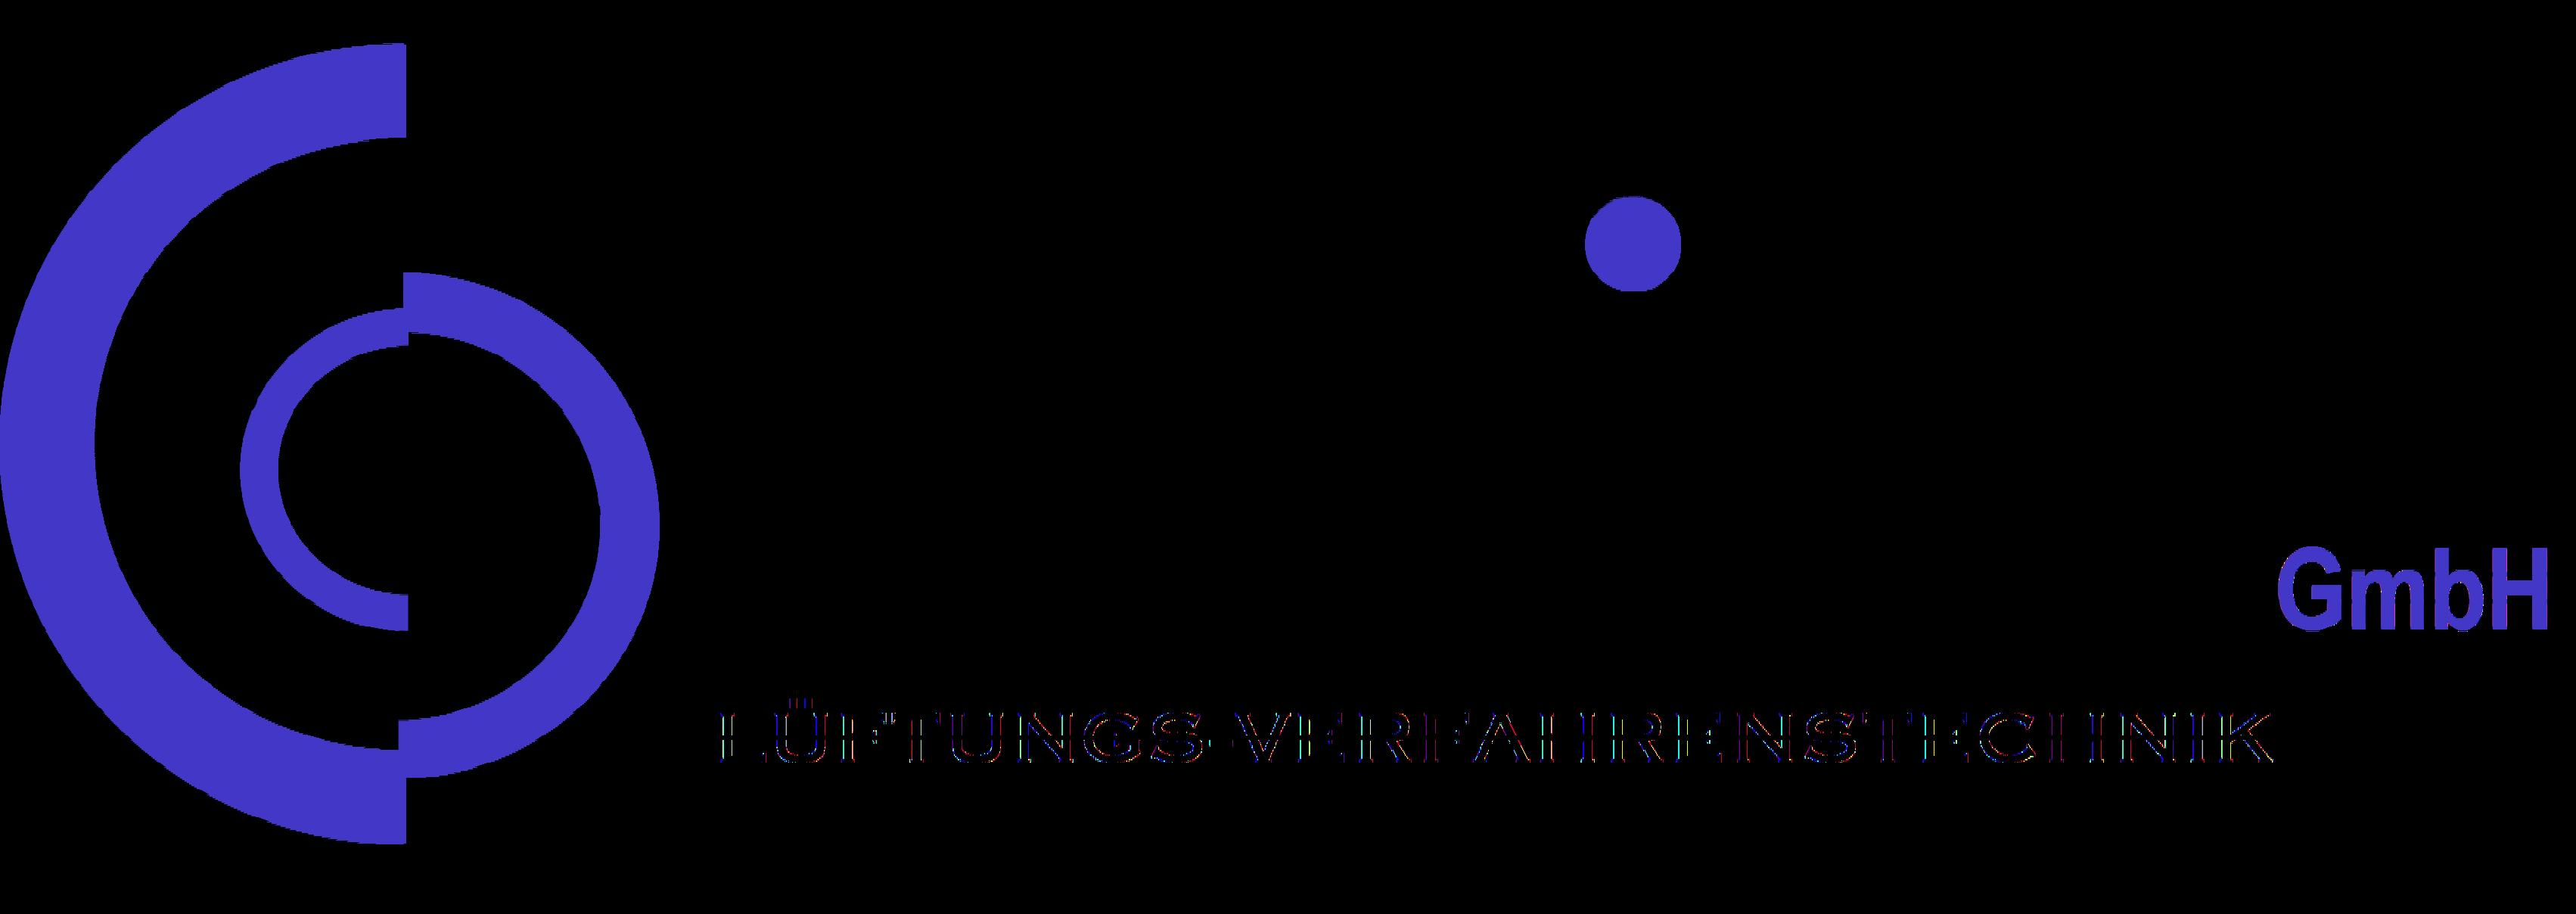 maier GmbH Lüftungs-Verfahrenstechnik